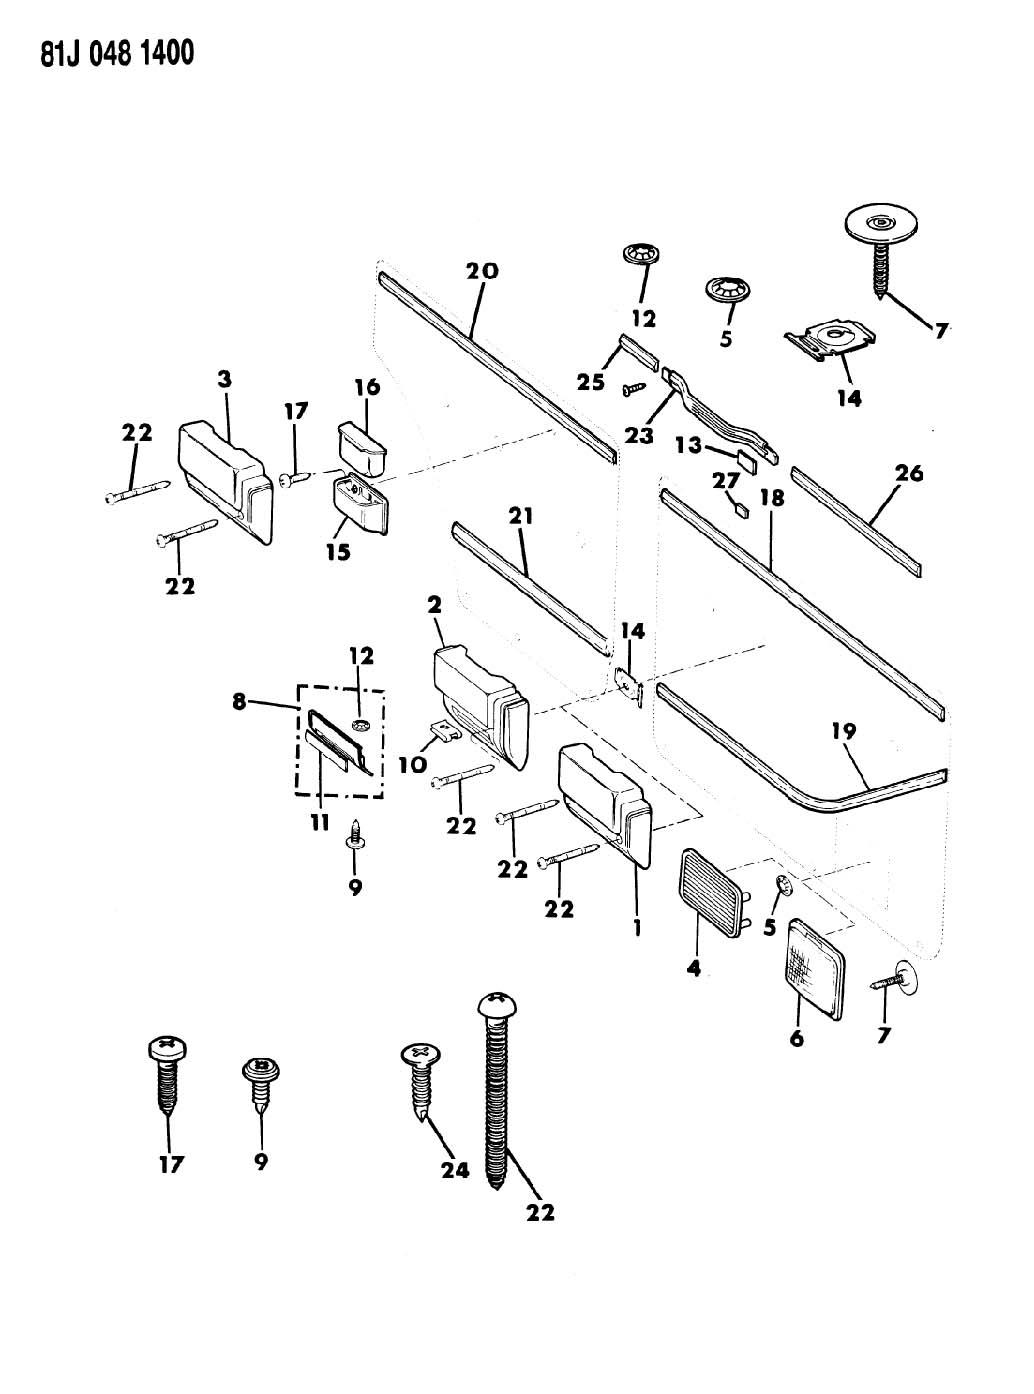 76 Jimmy Wiring Diagram Schematics Diagrams 1999 Gmc Sonoma Hvac Auto 3 Way Switch